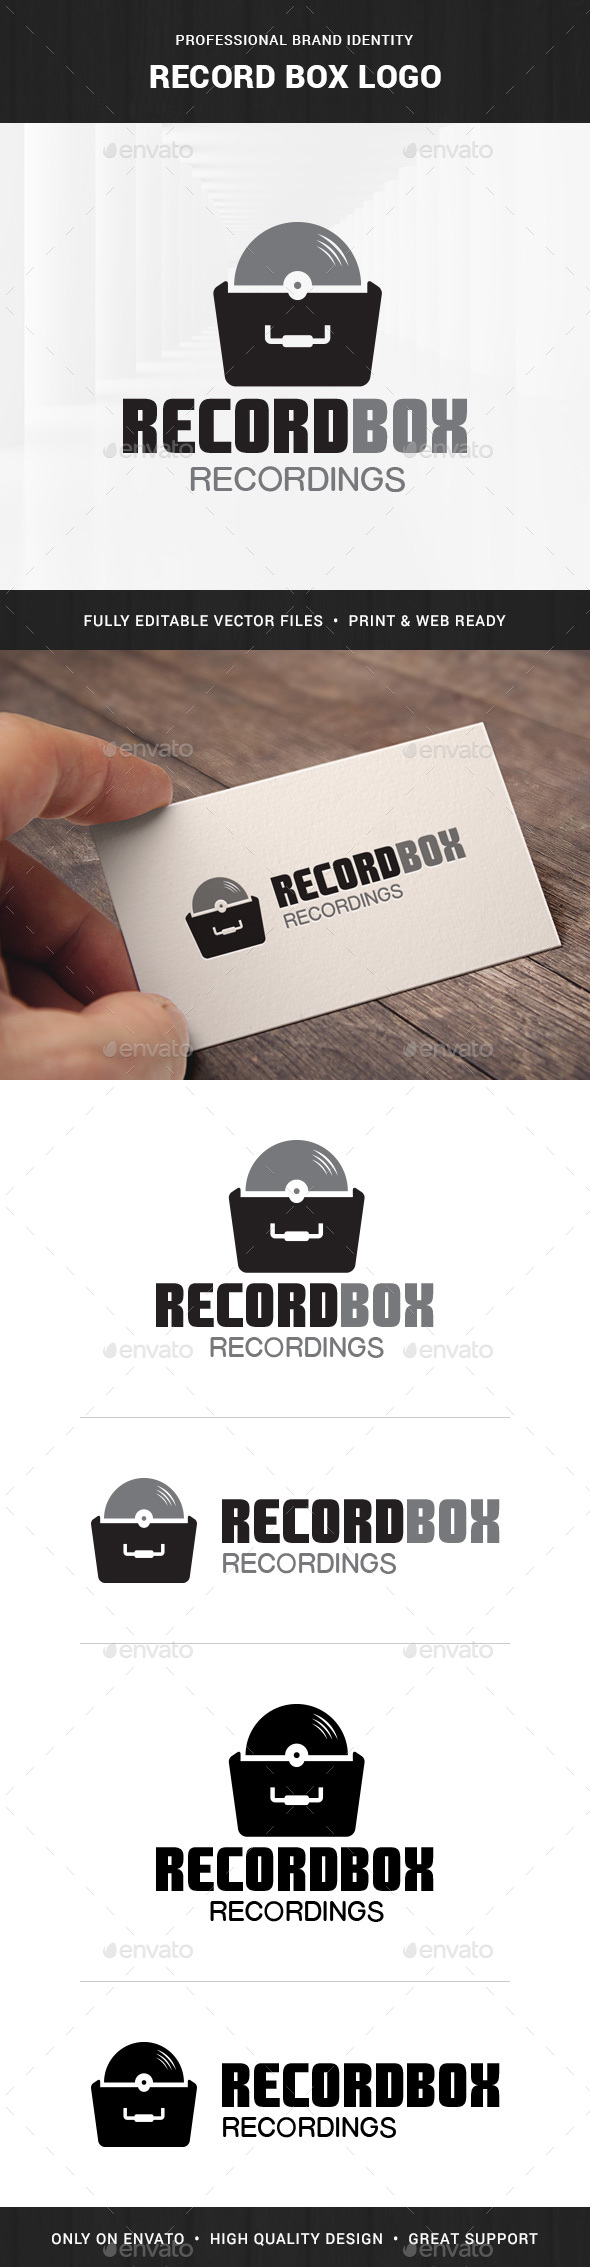 Record Box Logo Template - Objects Logo Templates